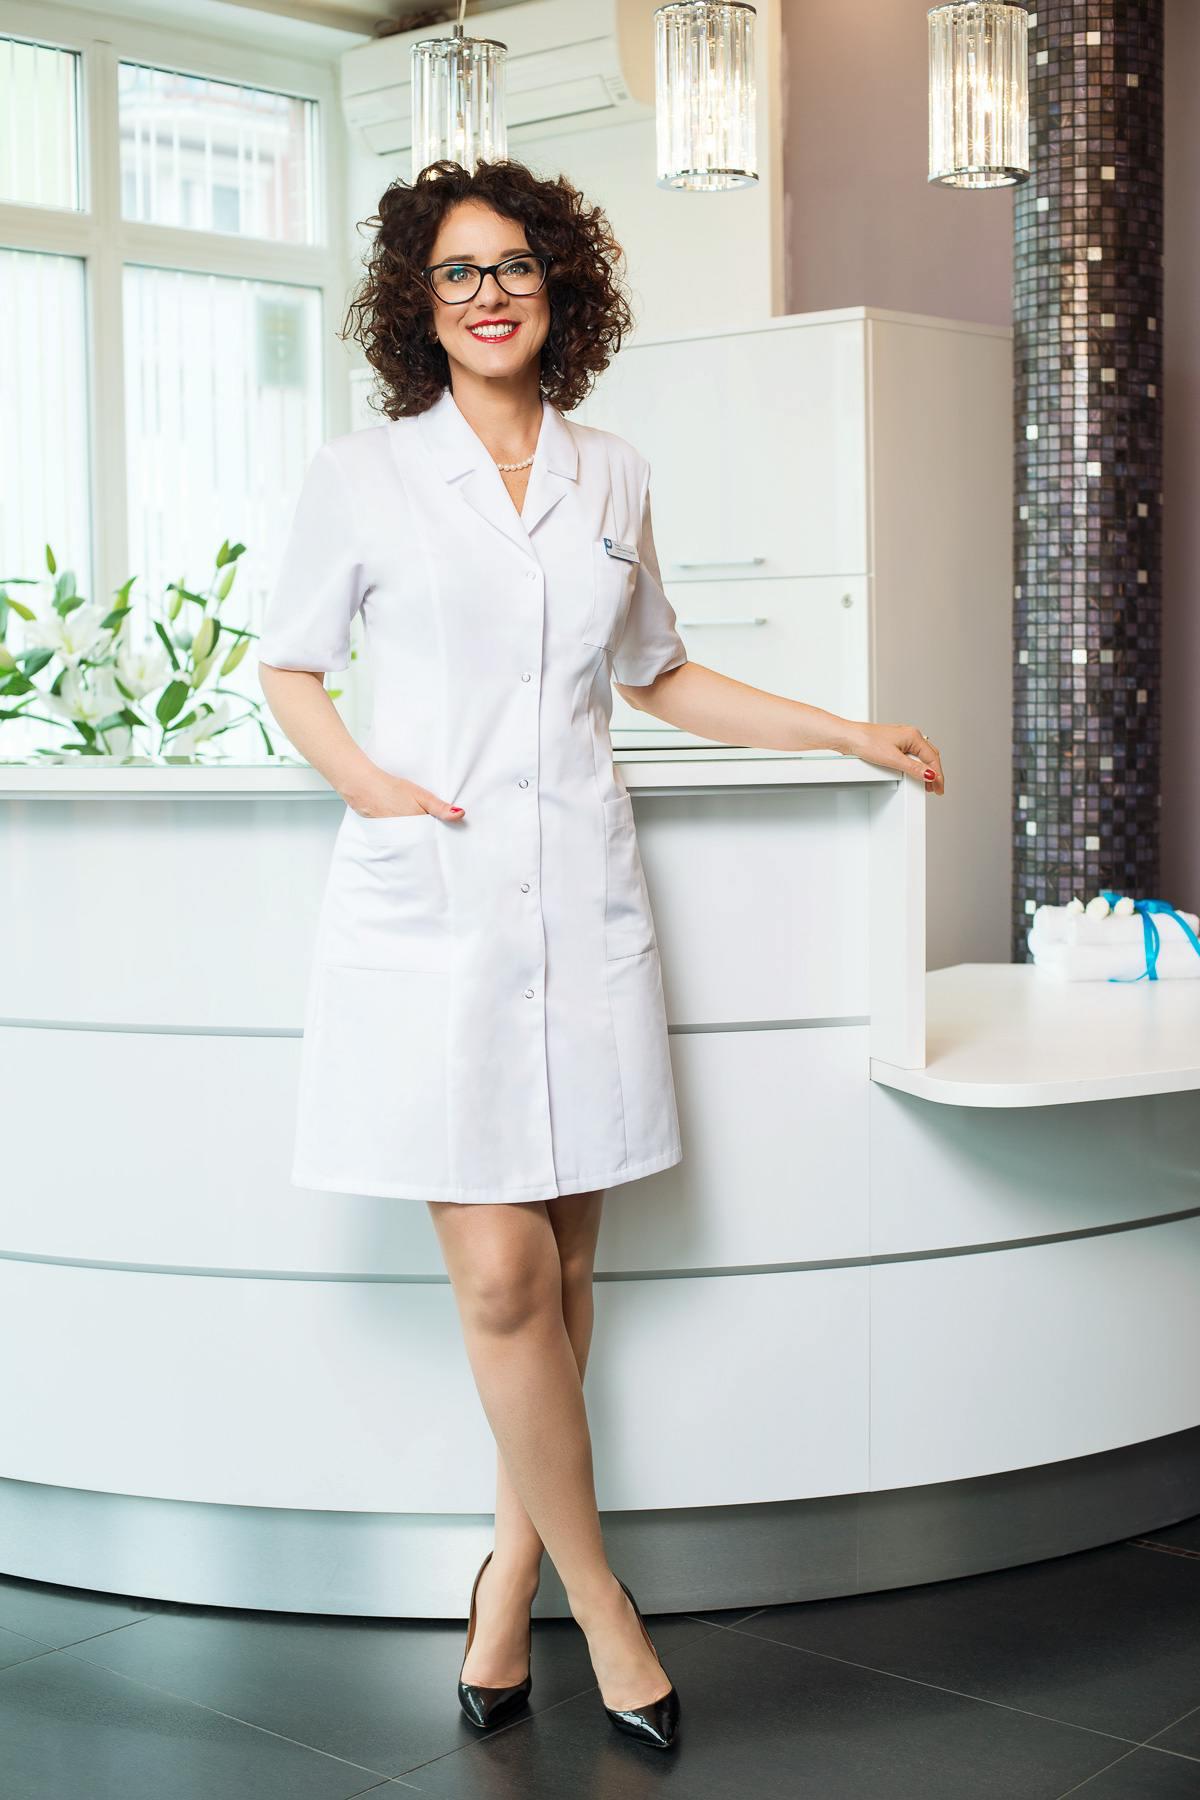 Zagalak Beauty Clinic - Maria Lorentowicz-Zagalak